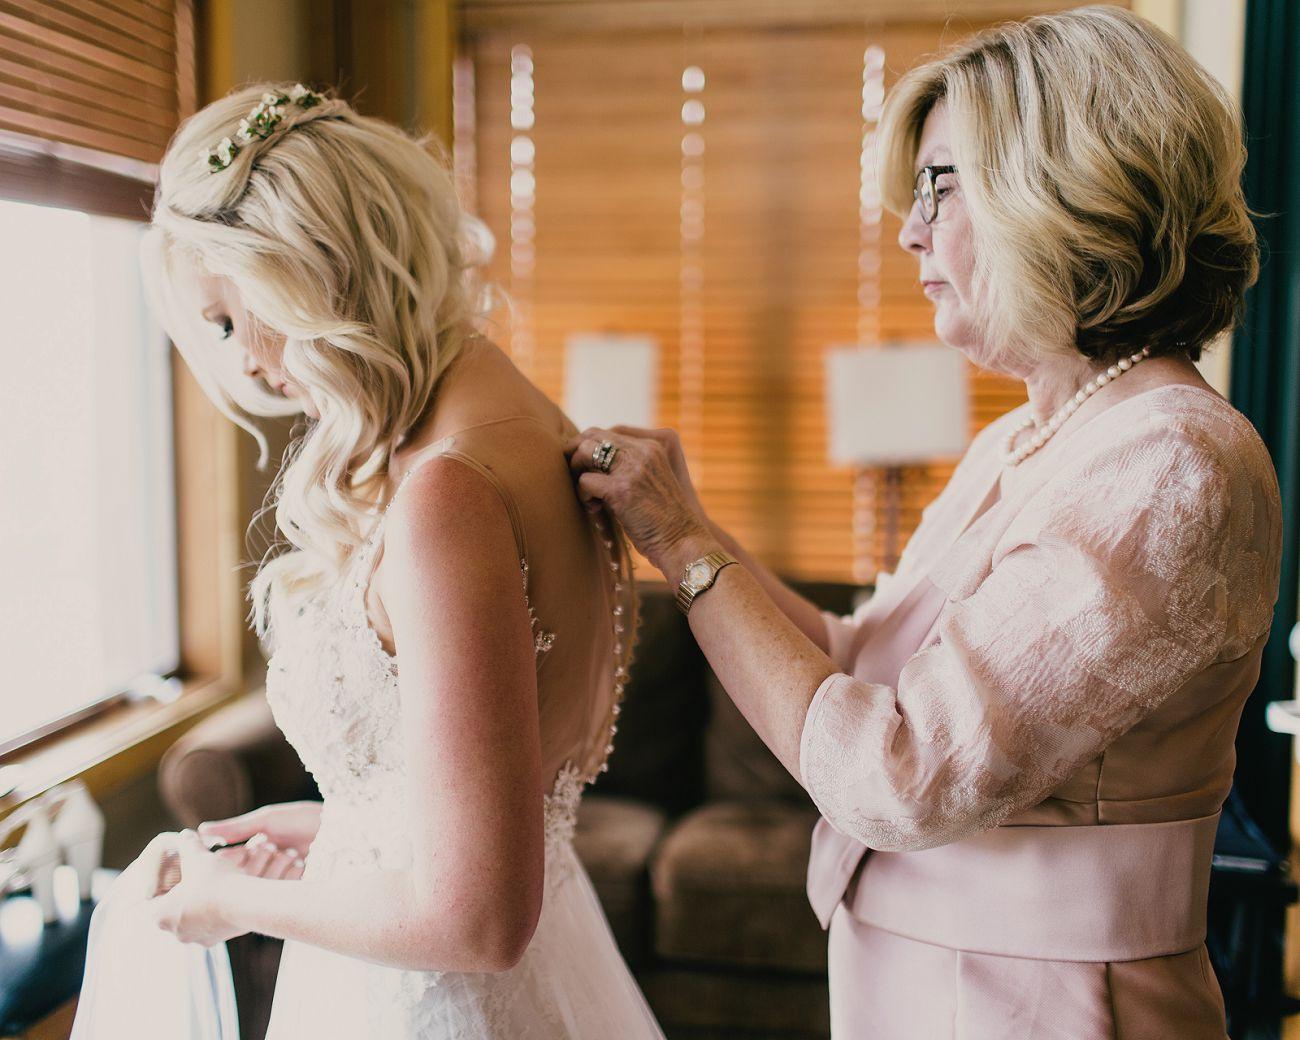 Jennifer_Mooney_Photo_Whitefish_mountain_resort_wedding_elegant_montana_wedding_004.jpg